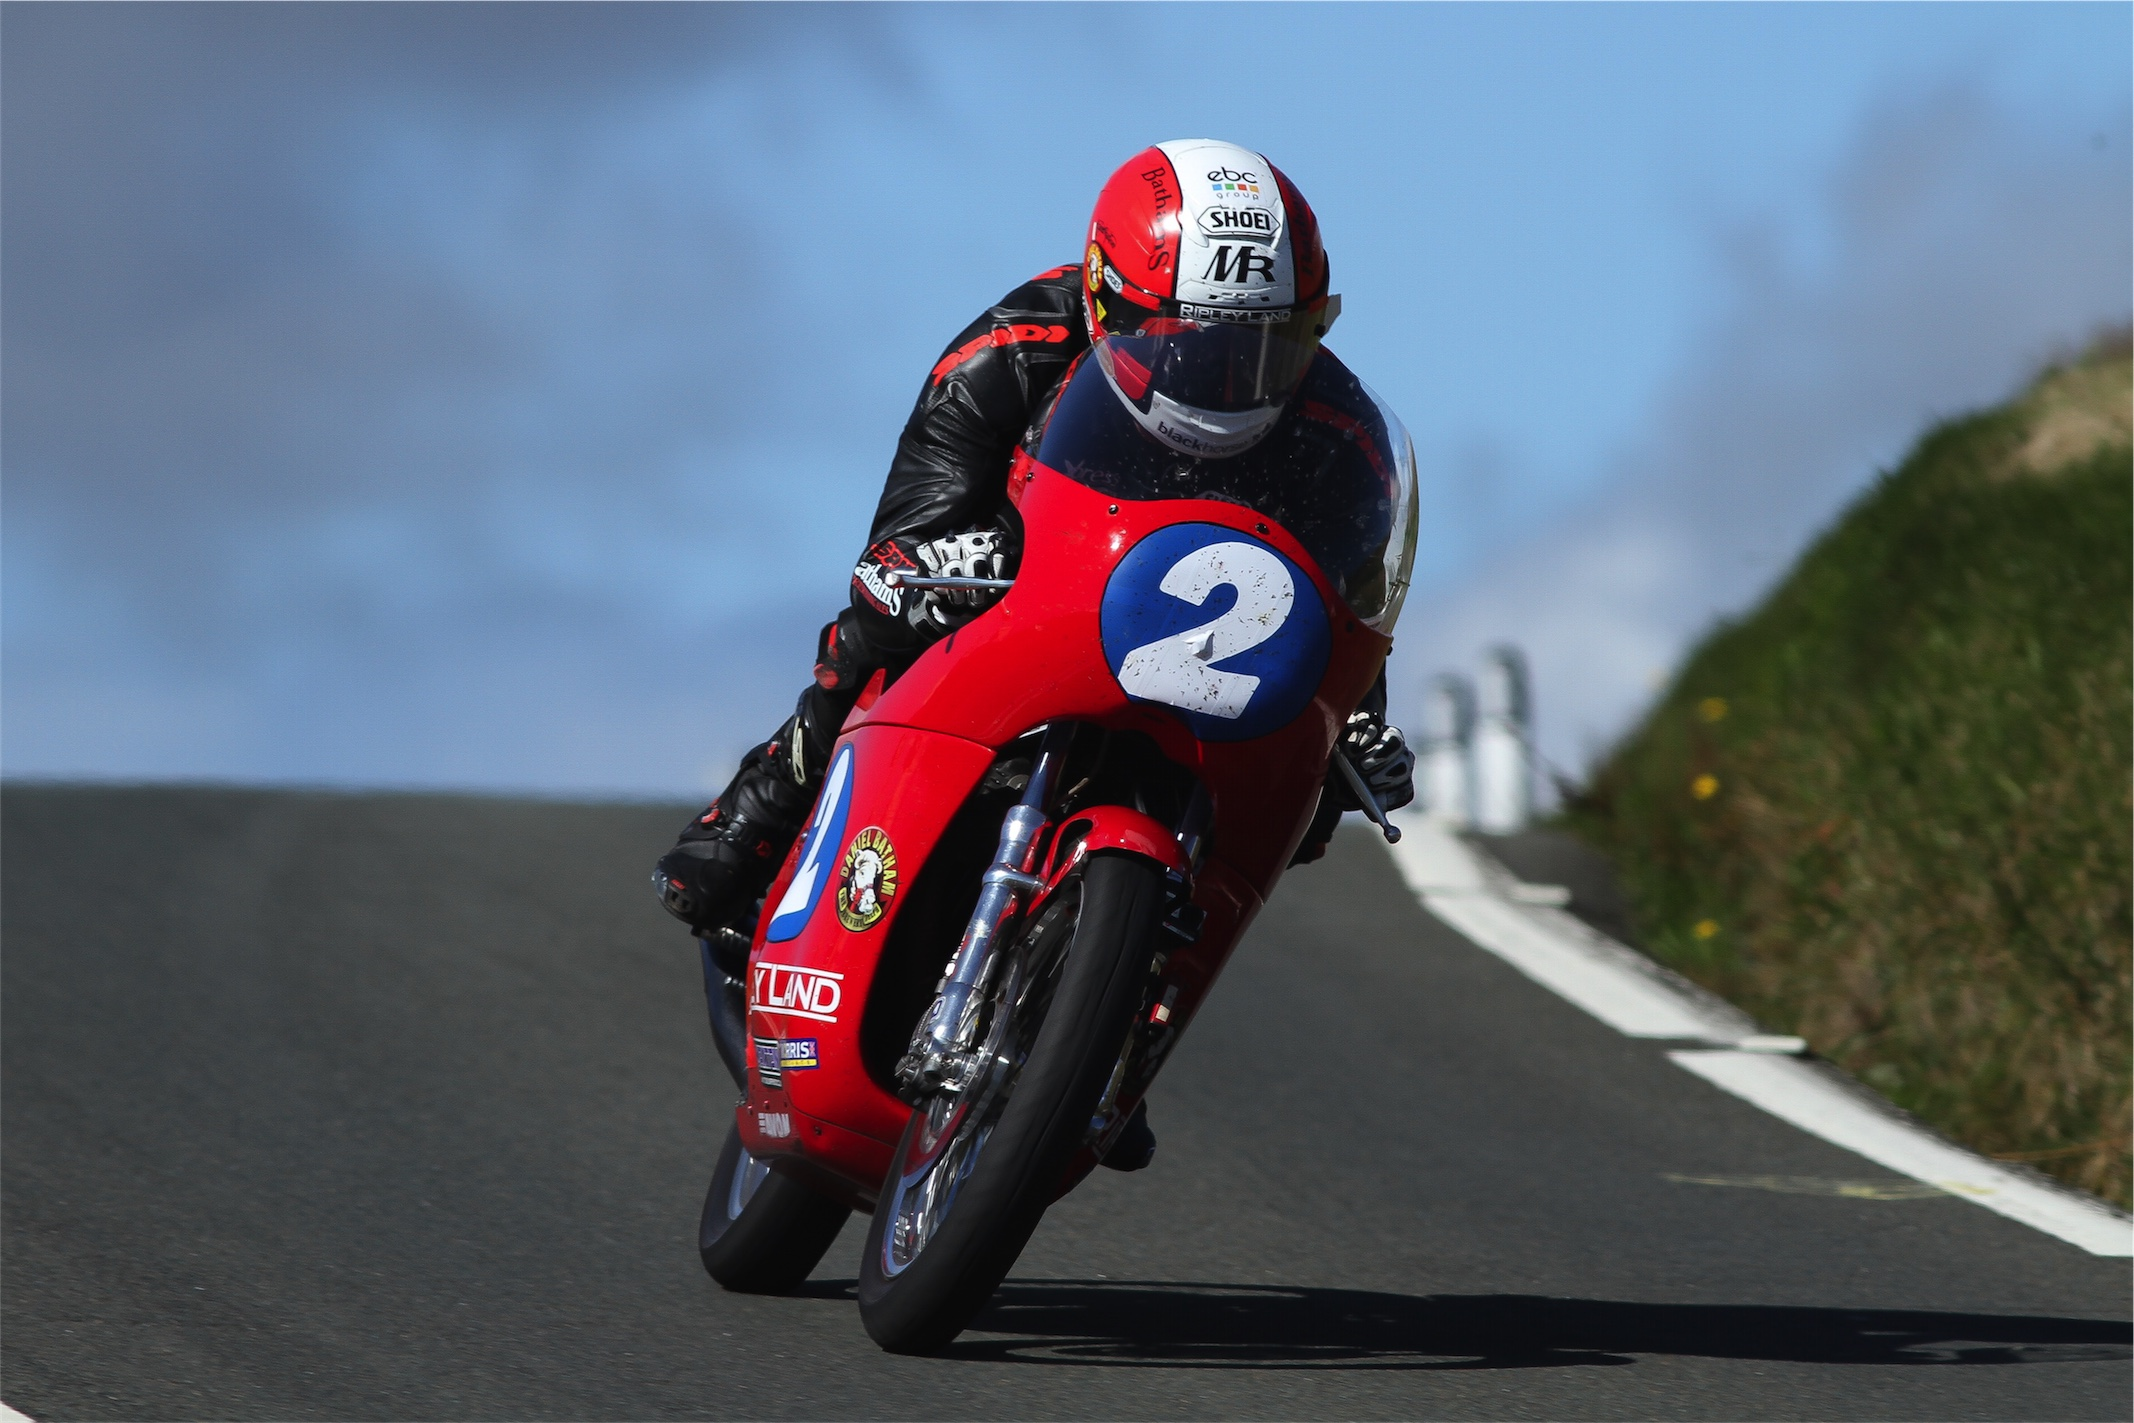 Star Quality Feel To Ripley Land Racing's Classic TT Team